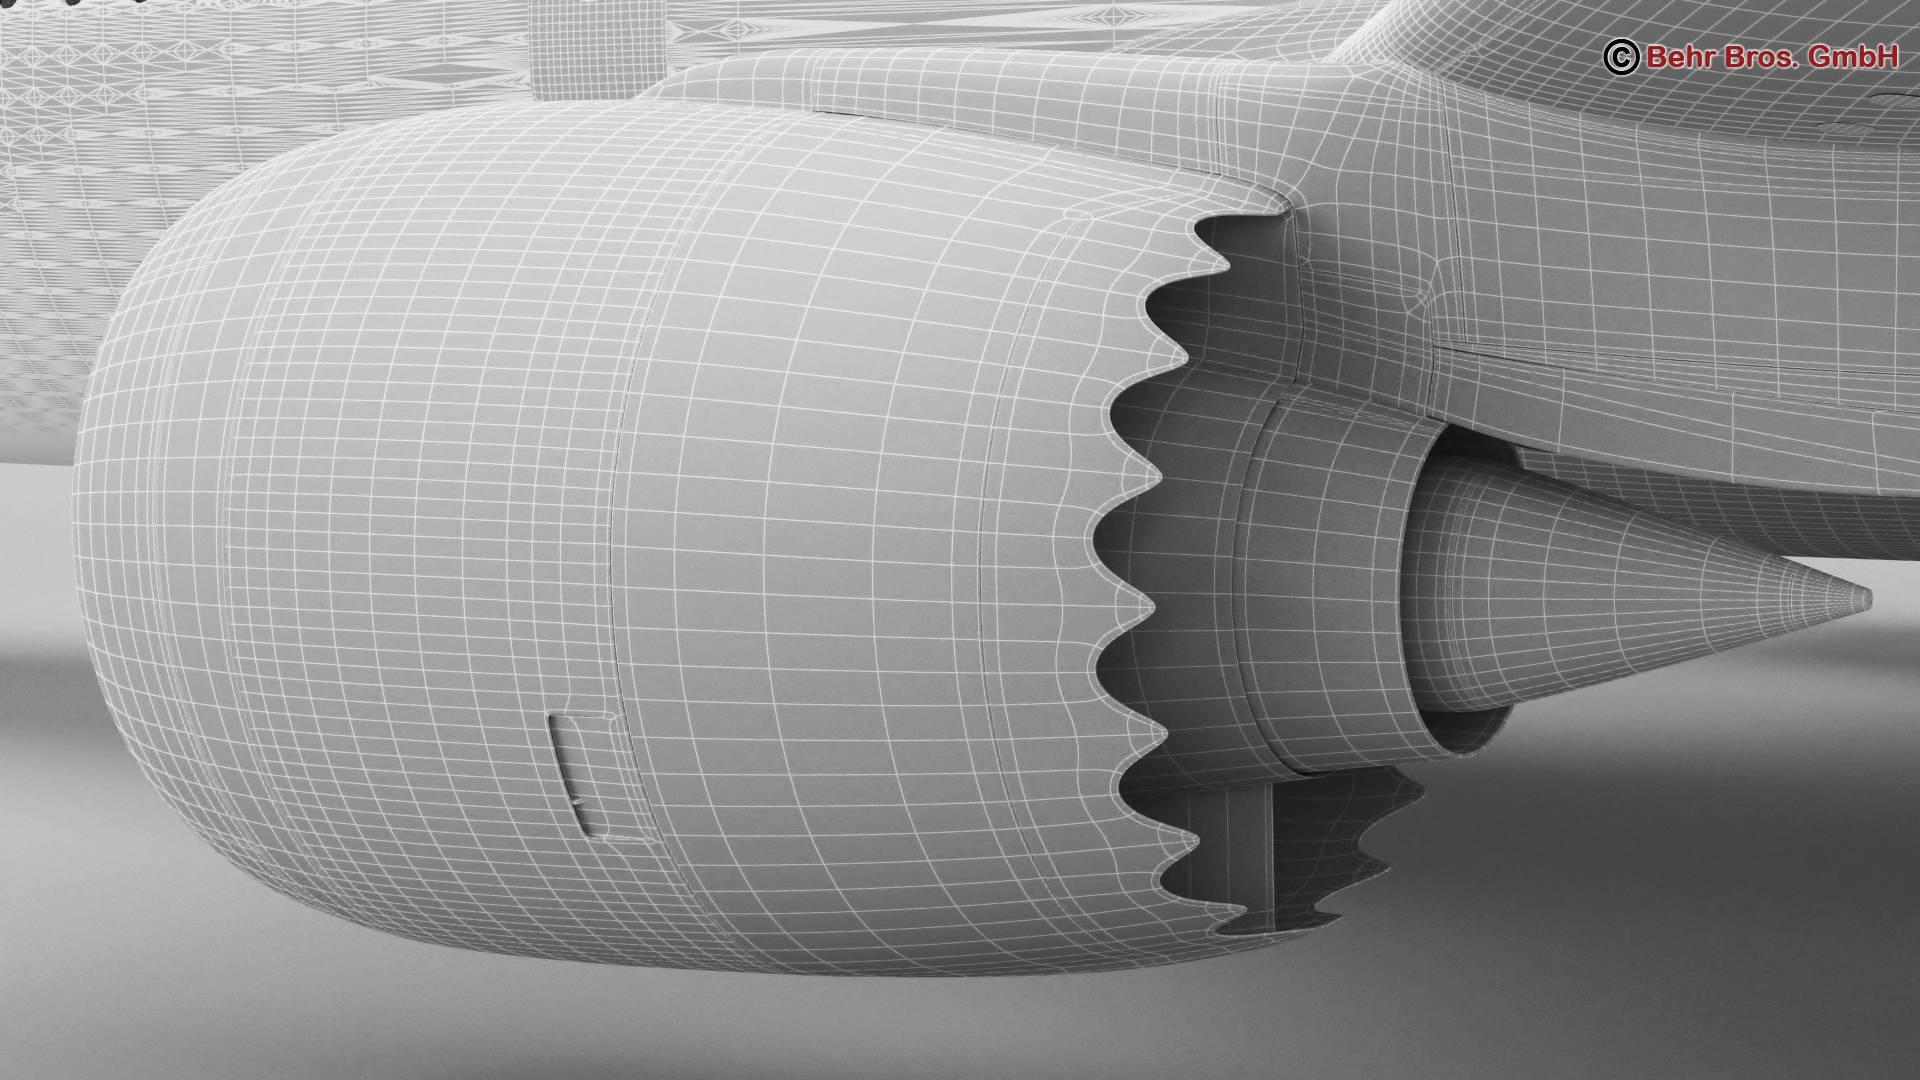 boeing 787-8 3d model 3ds max fbx c4d lwo ma mb obj 251368